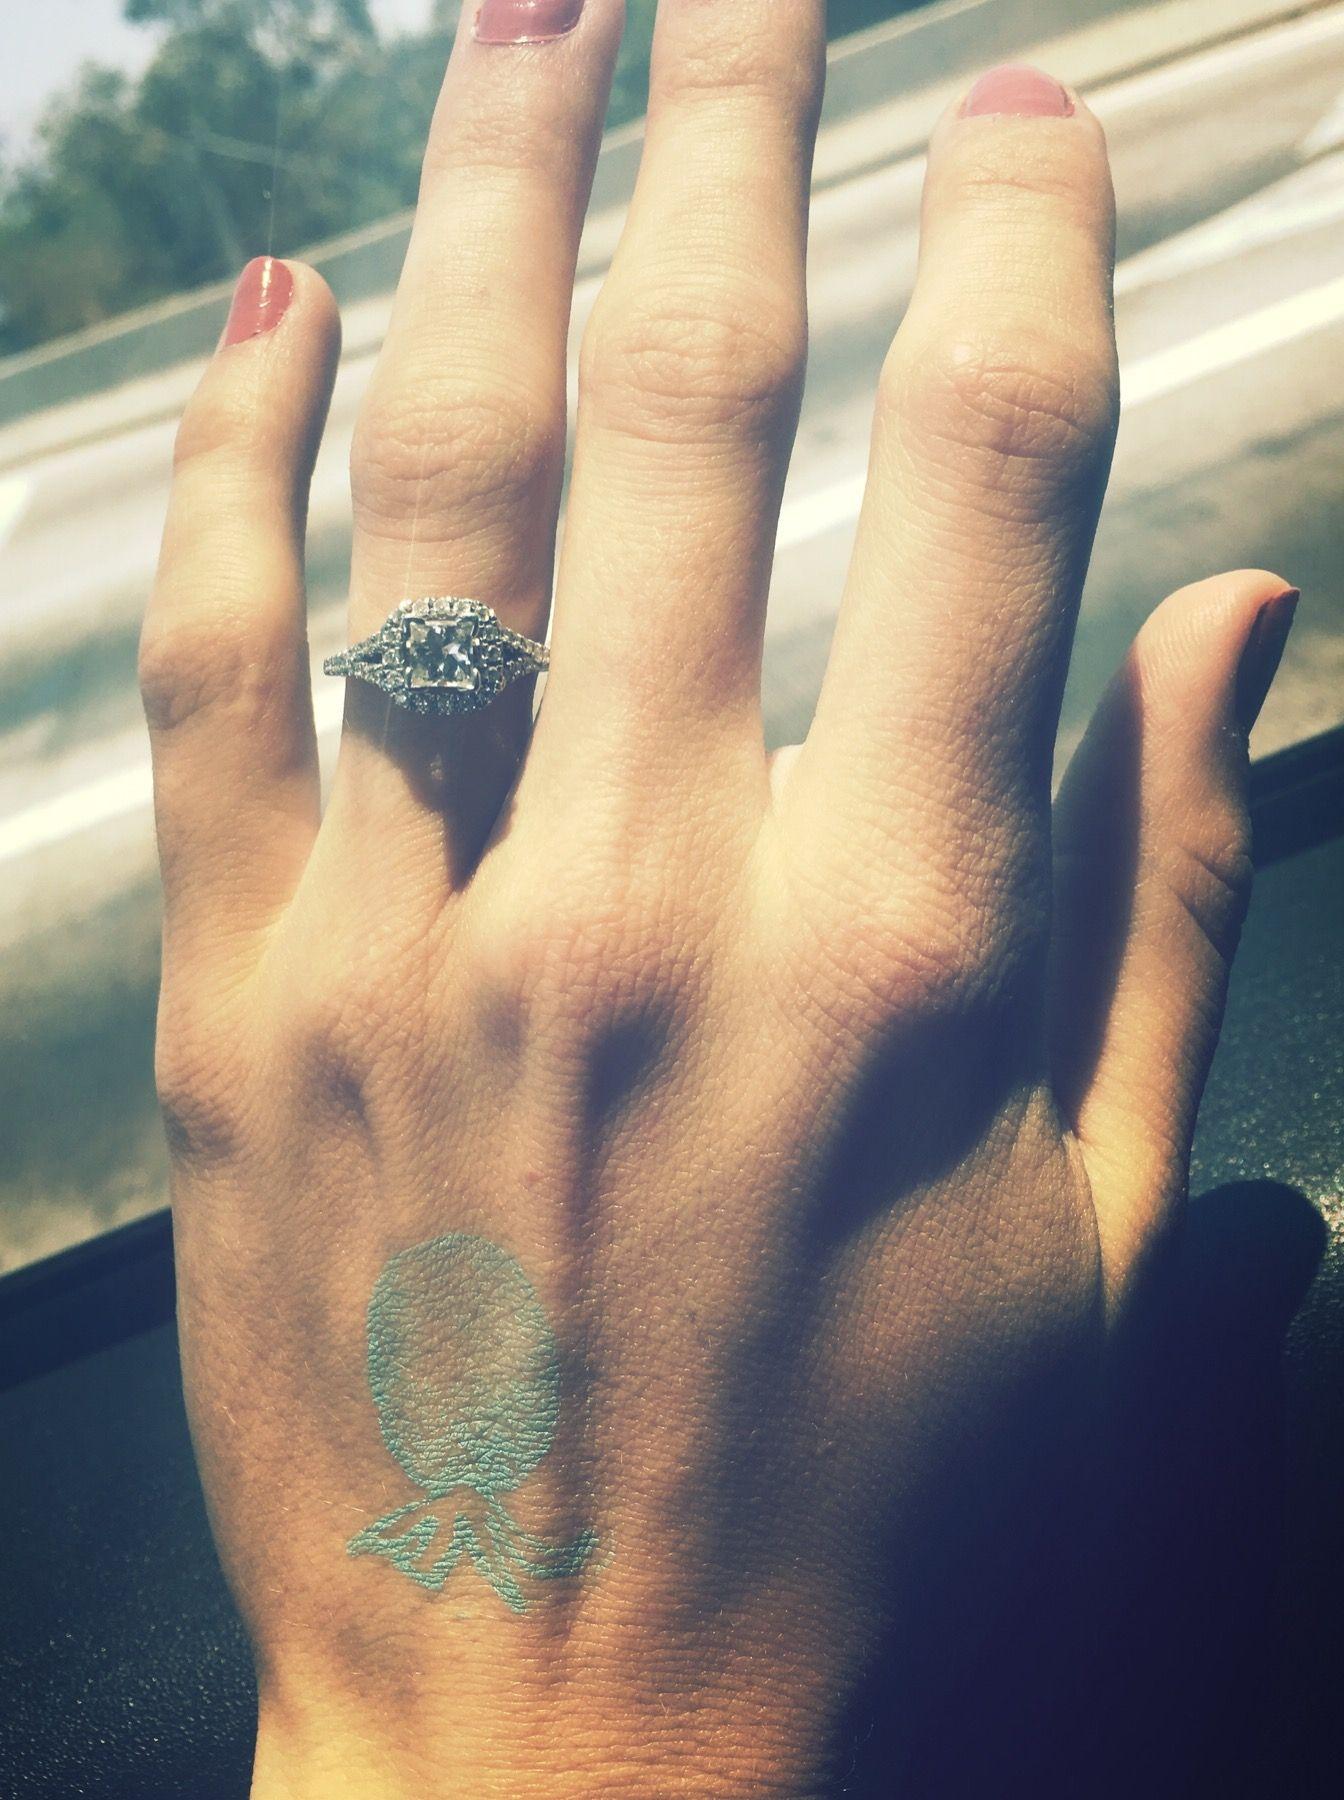 I love my ring 💍💕